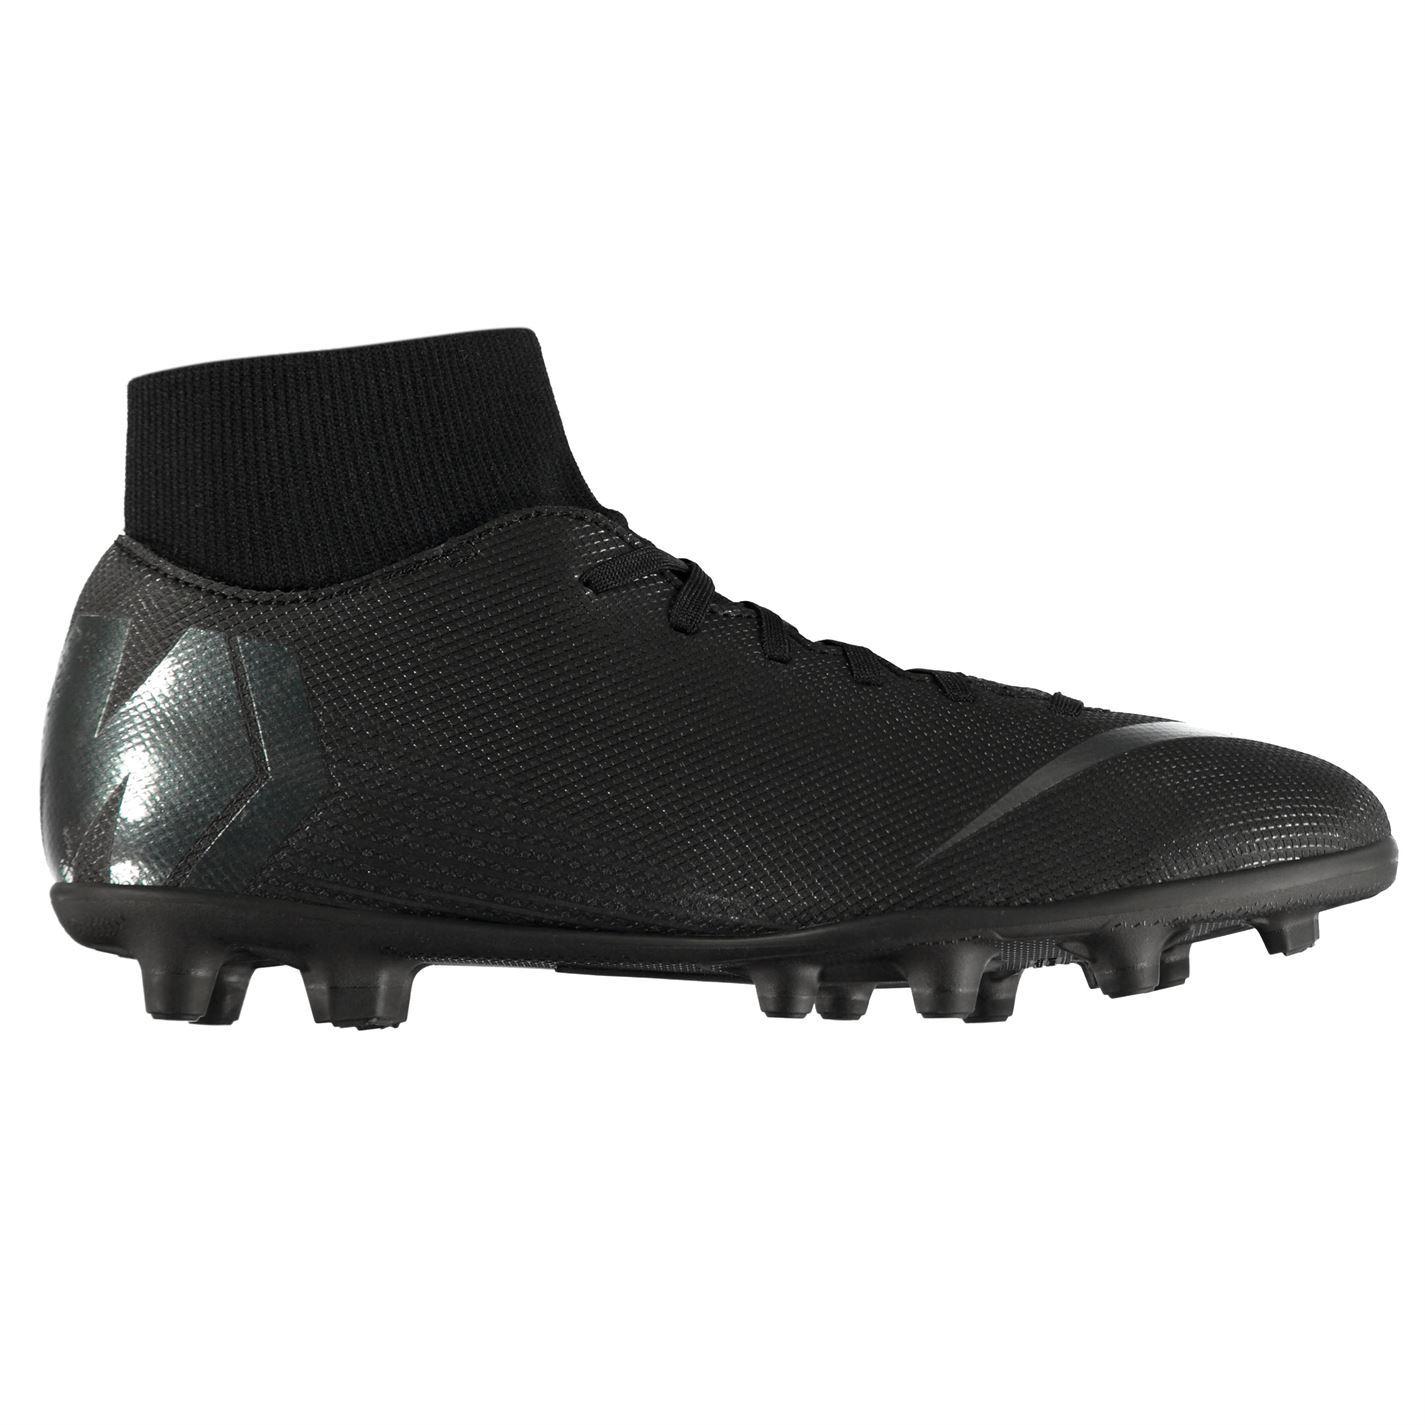 c60a3f9684b38 Nike Mercurial Superfly Club DF FG Firm Ground Football Boots Mens ...